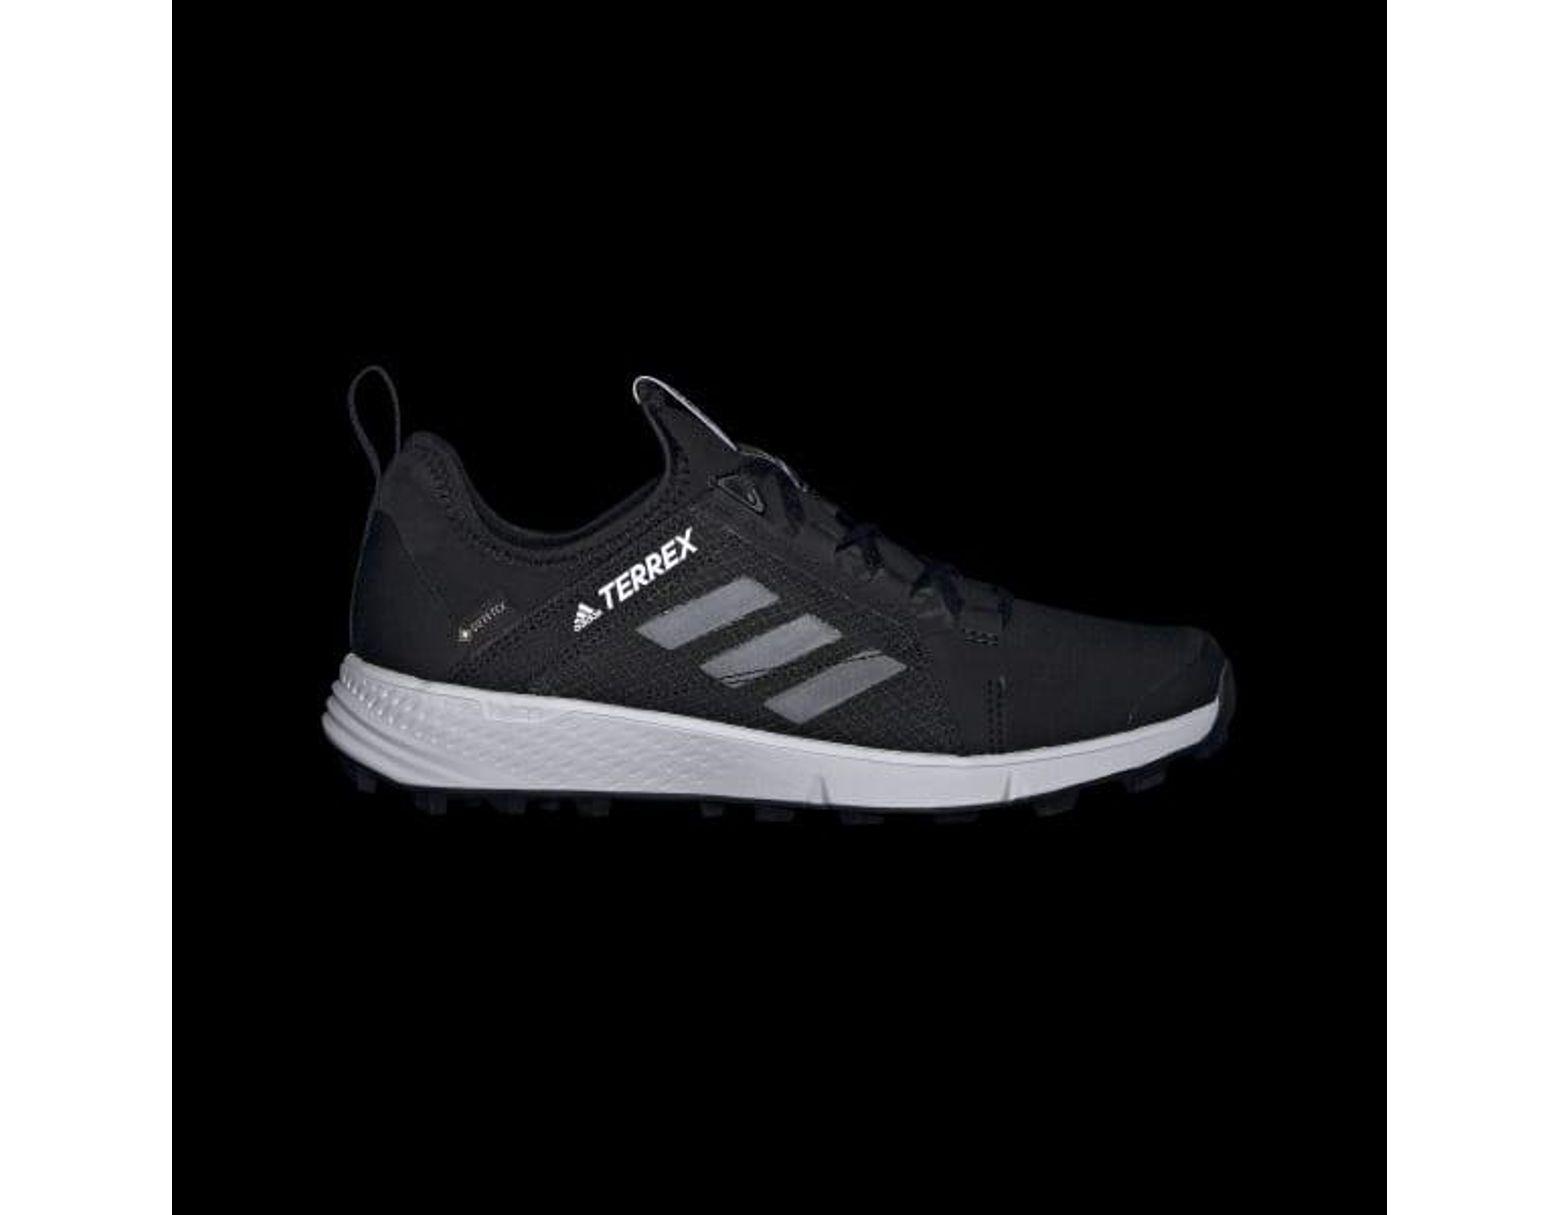 0ffc0d341af Women's Black Terrex Speed Gtx Shoes